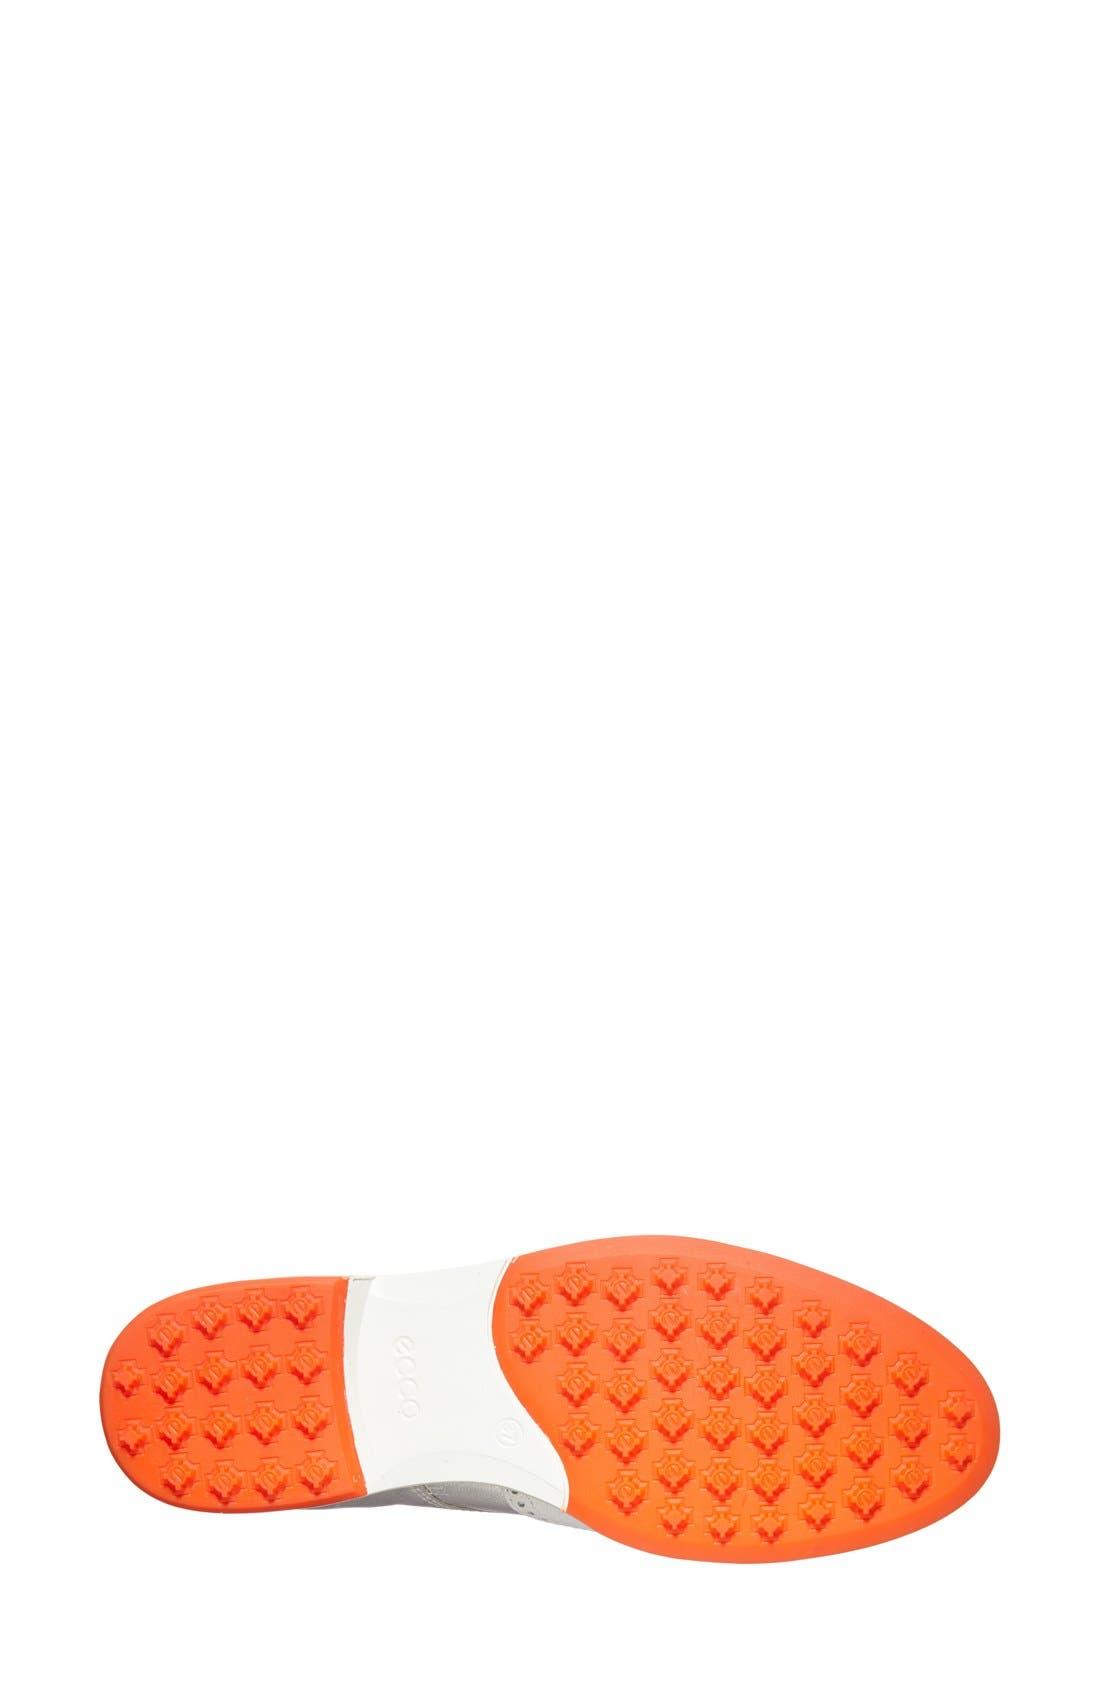 Alternate Image 4  - ECCO 'Tour' Hybrid Wingtip Golf Shoe (Women)